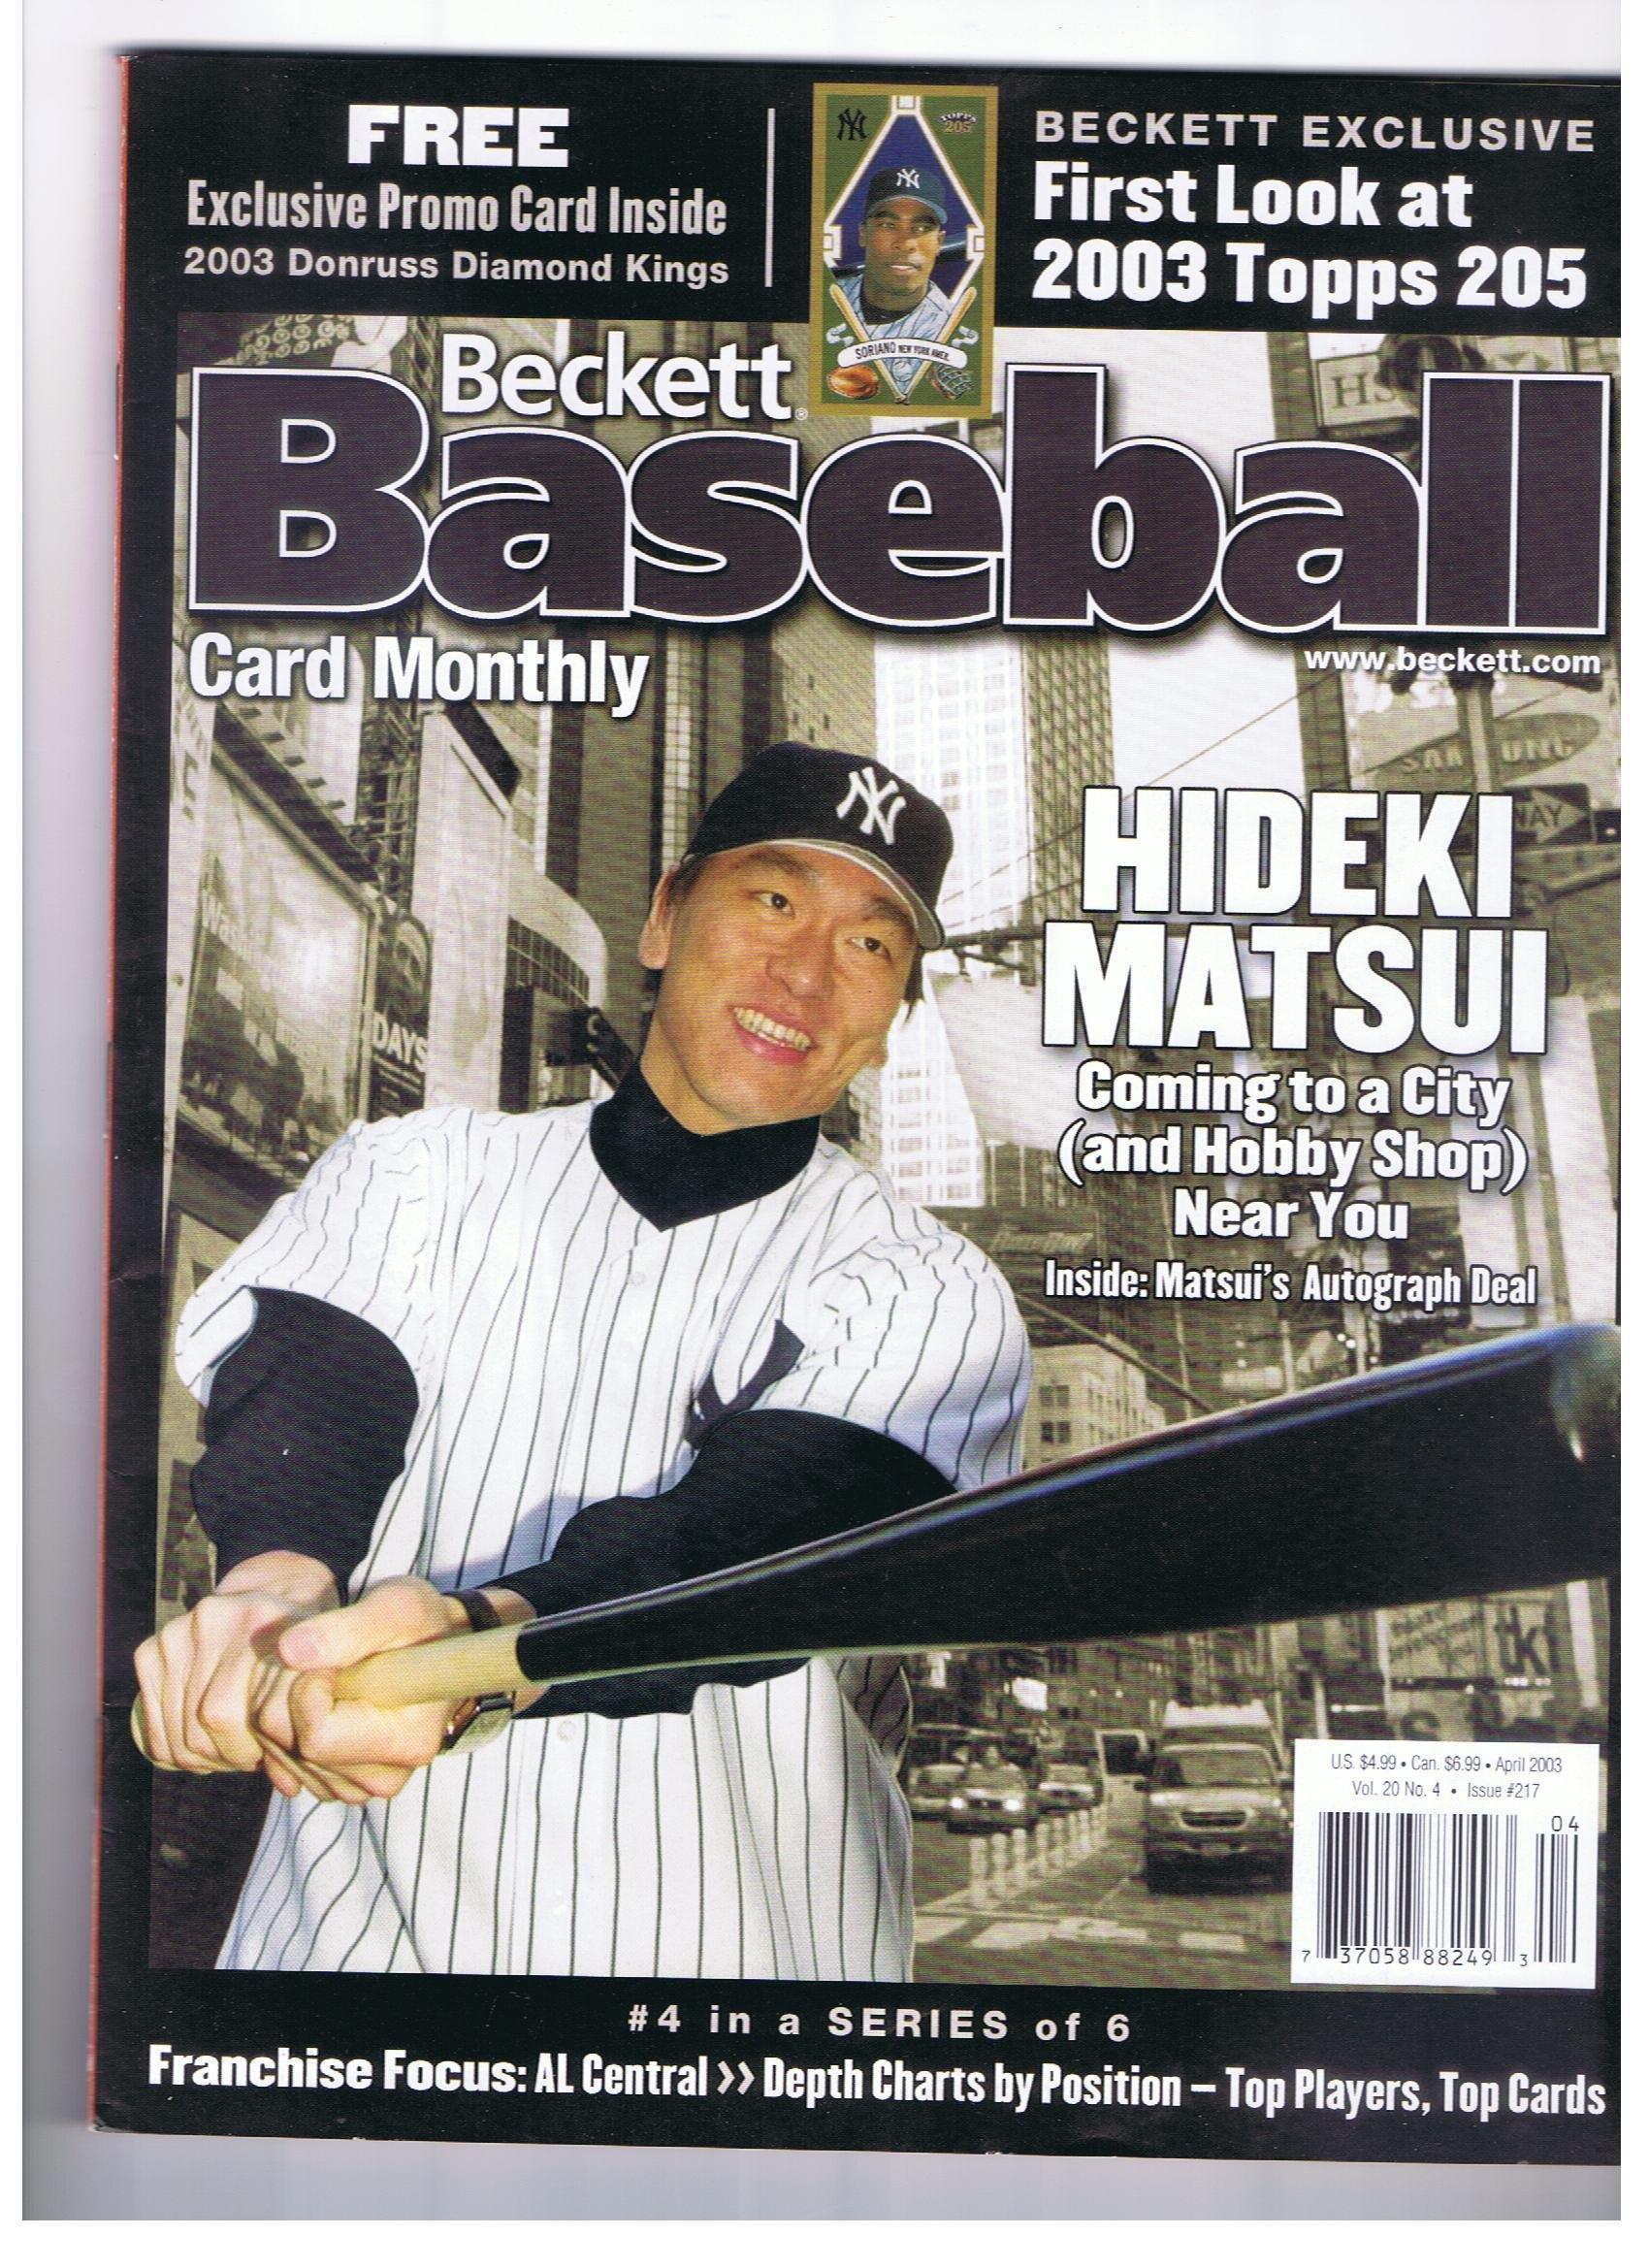 Beckett Baseball Card Monthly 217 - April, 2003 (Volume 20, Number 4) pdf